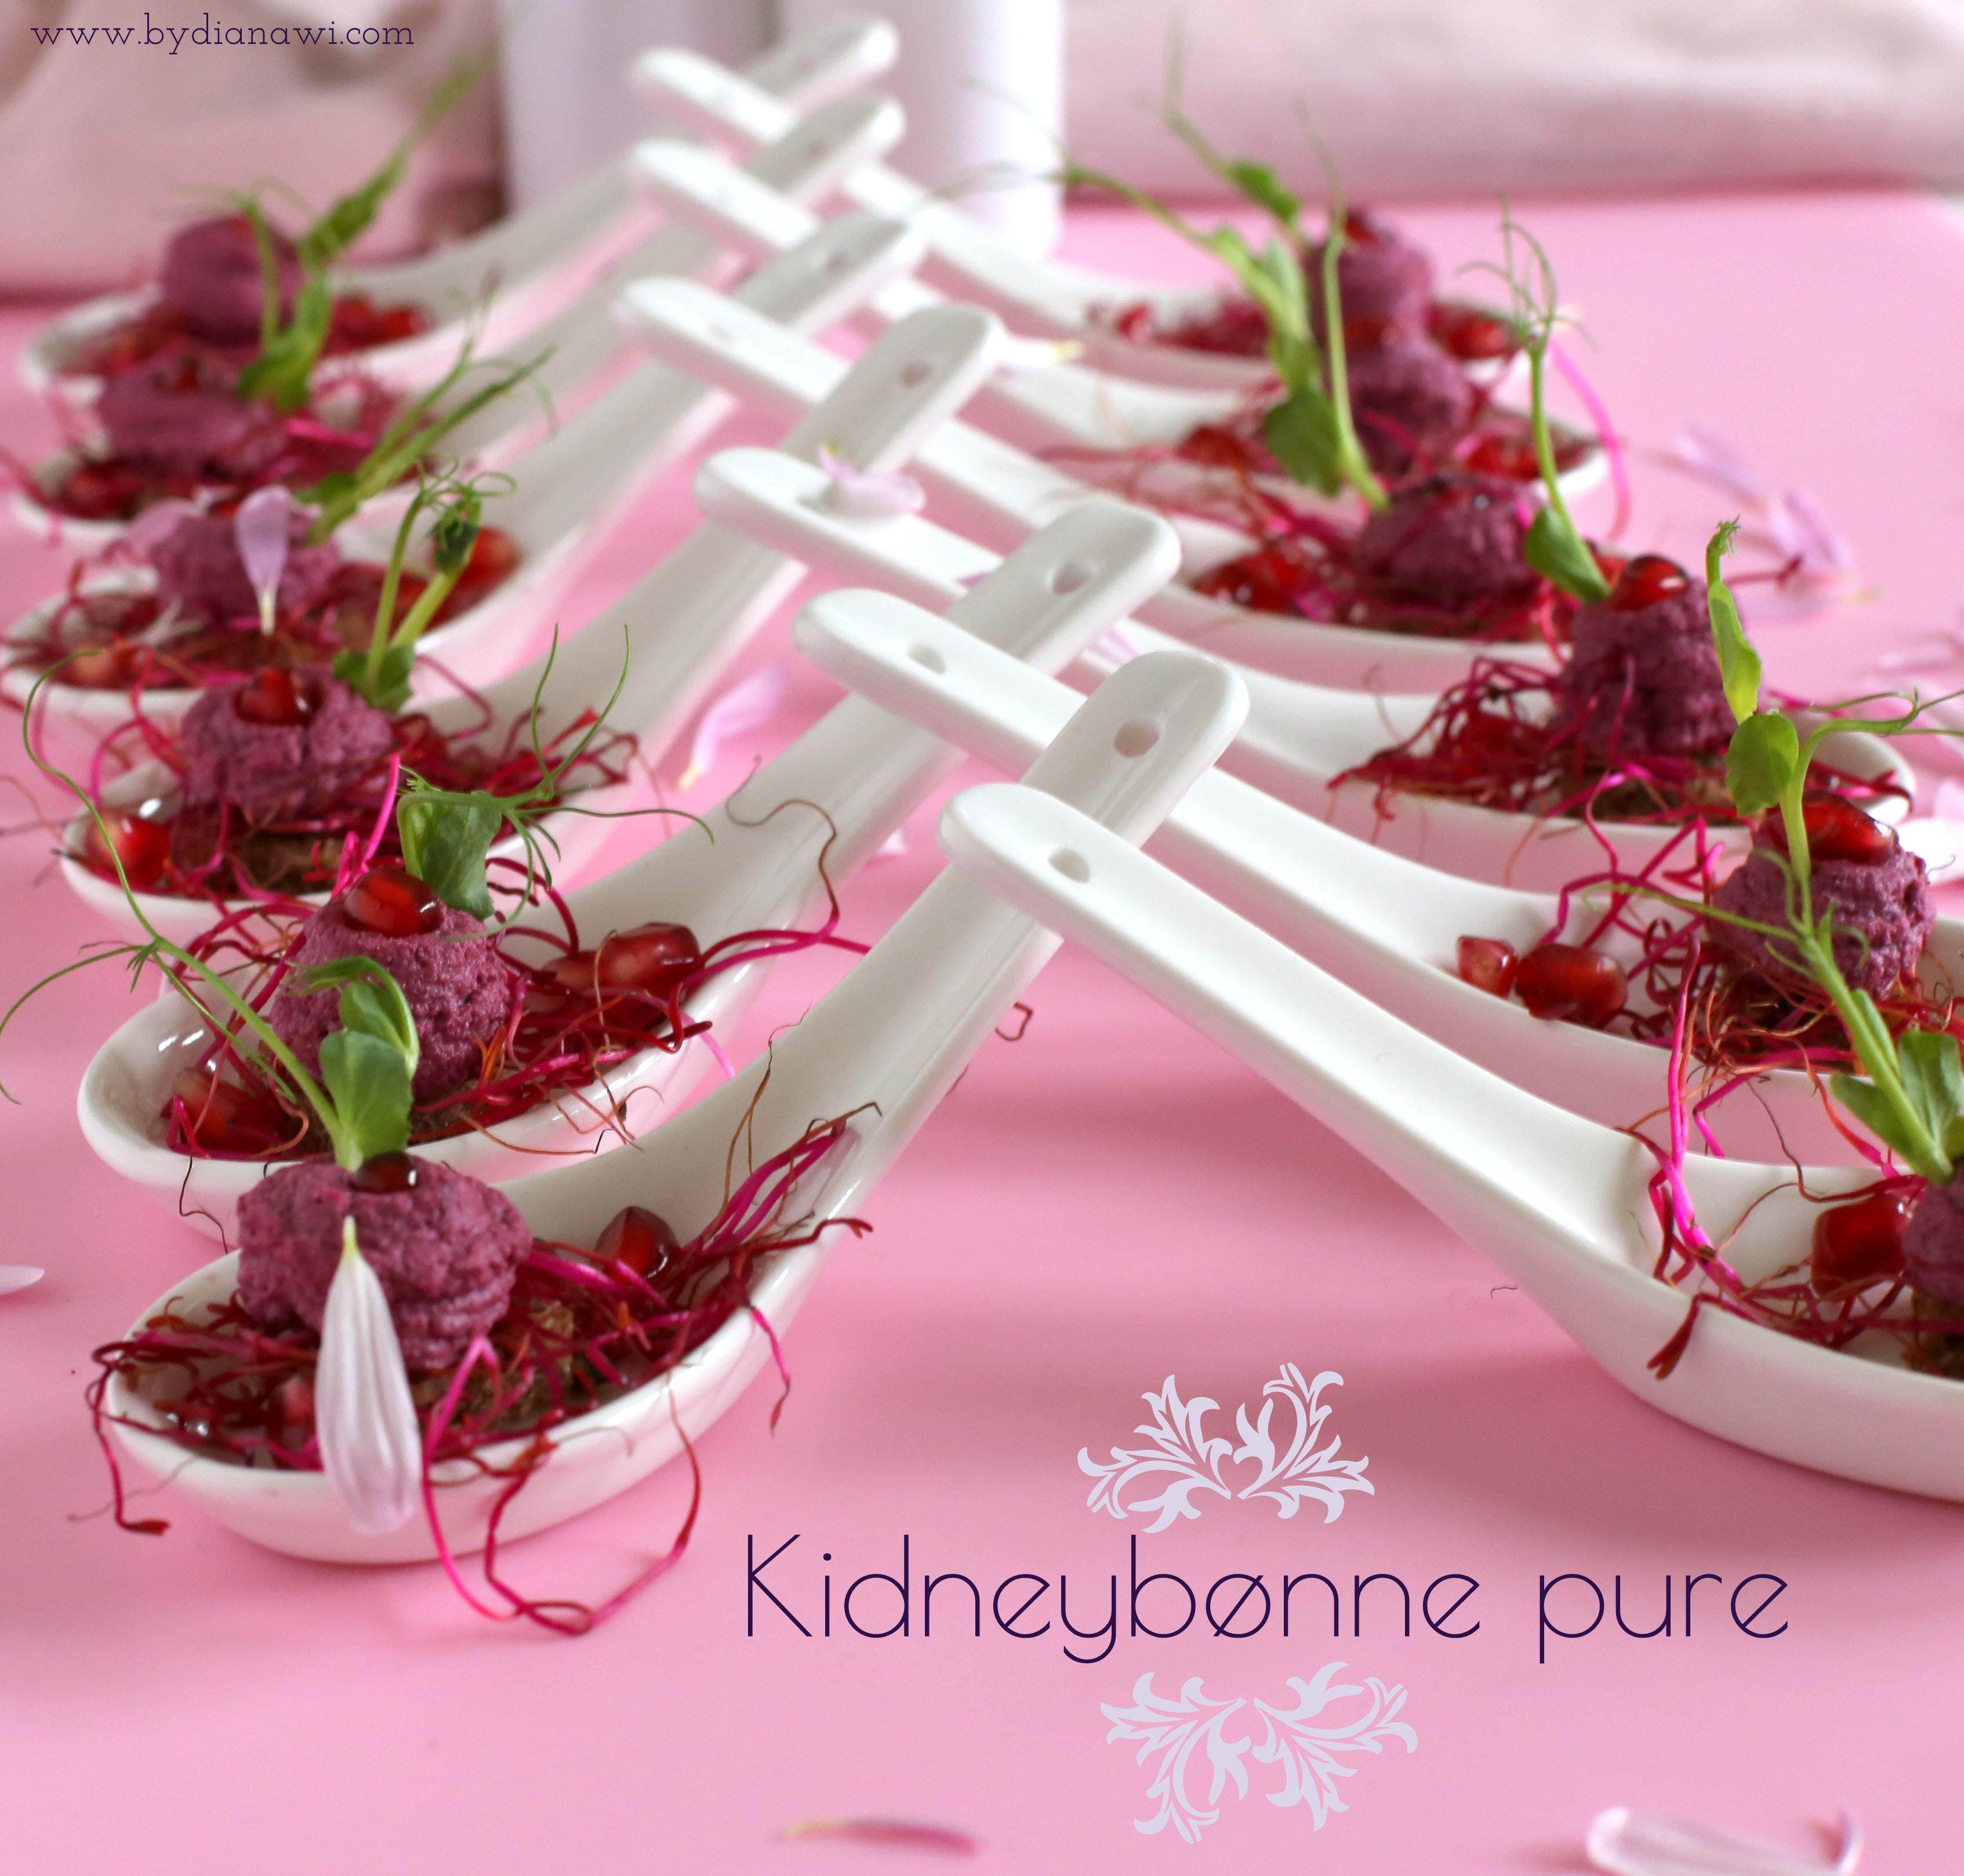 Små appetitvækkere med kidneybønne pure